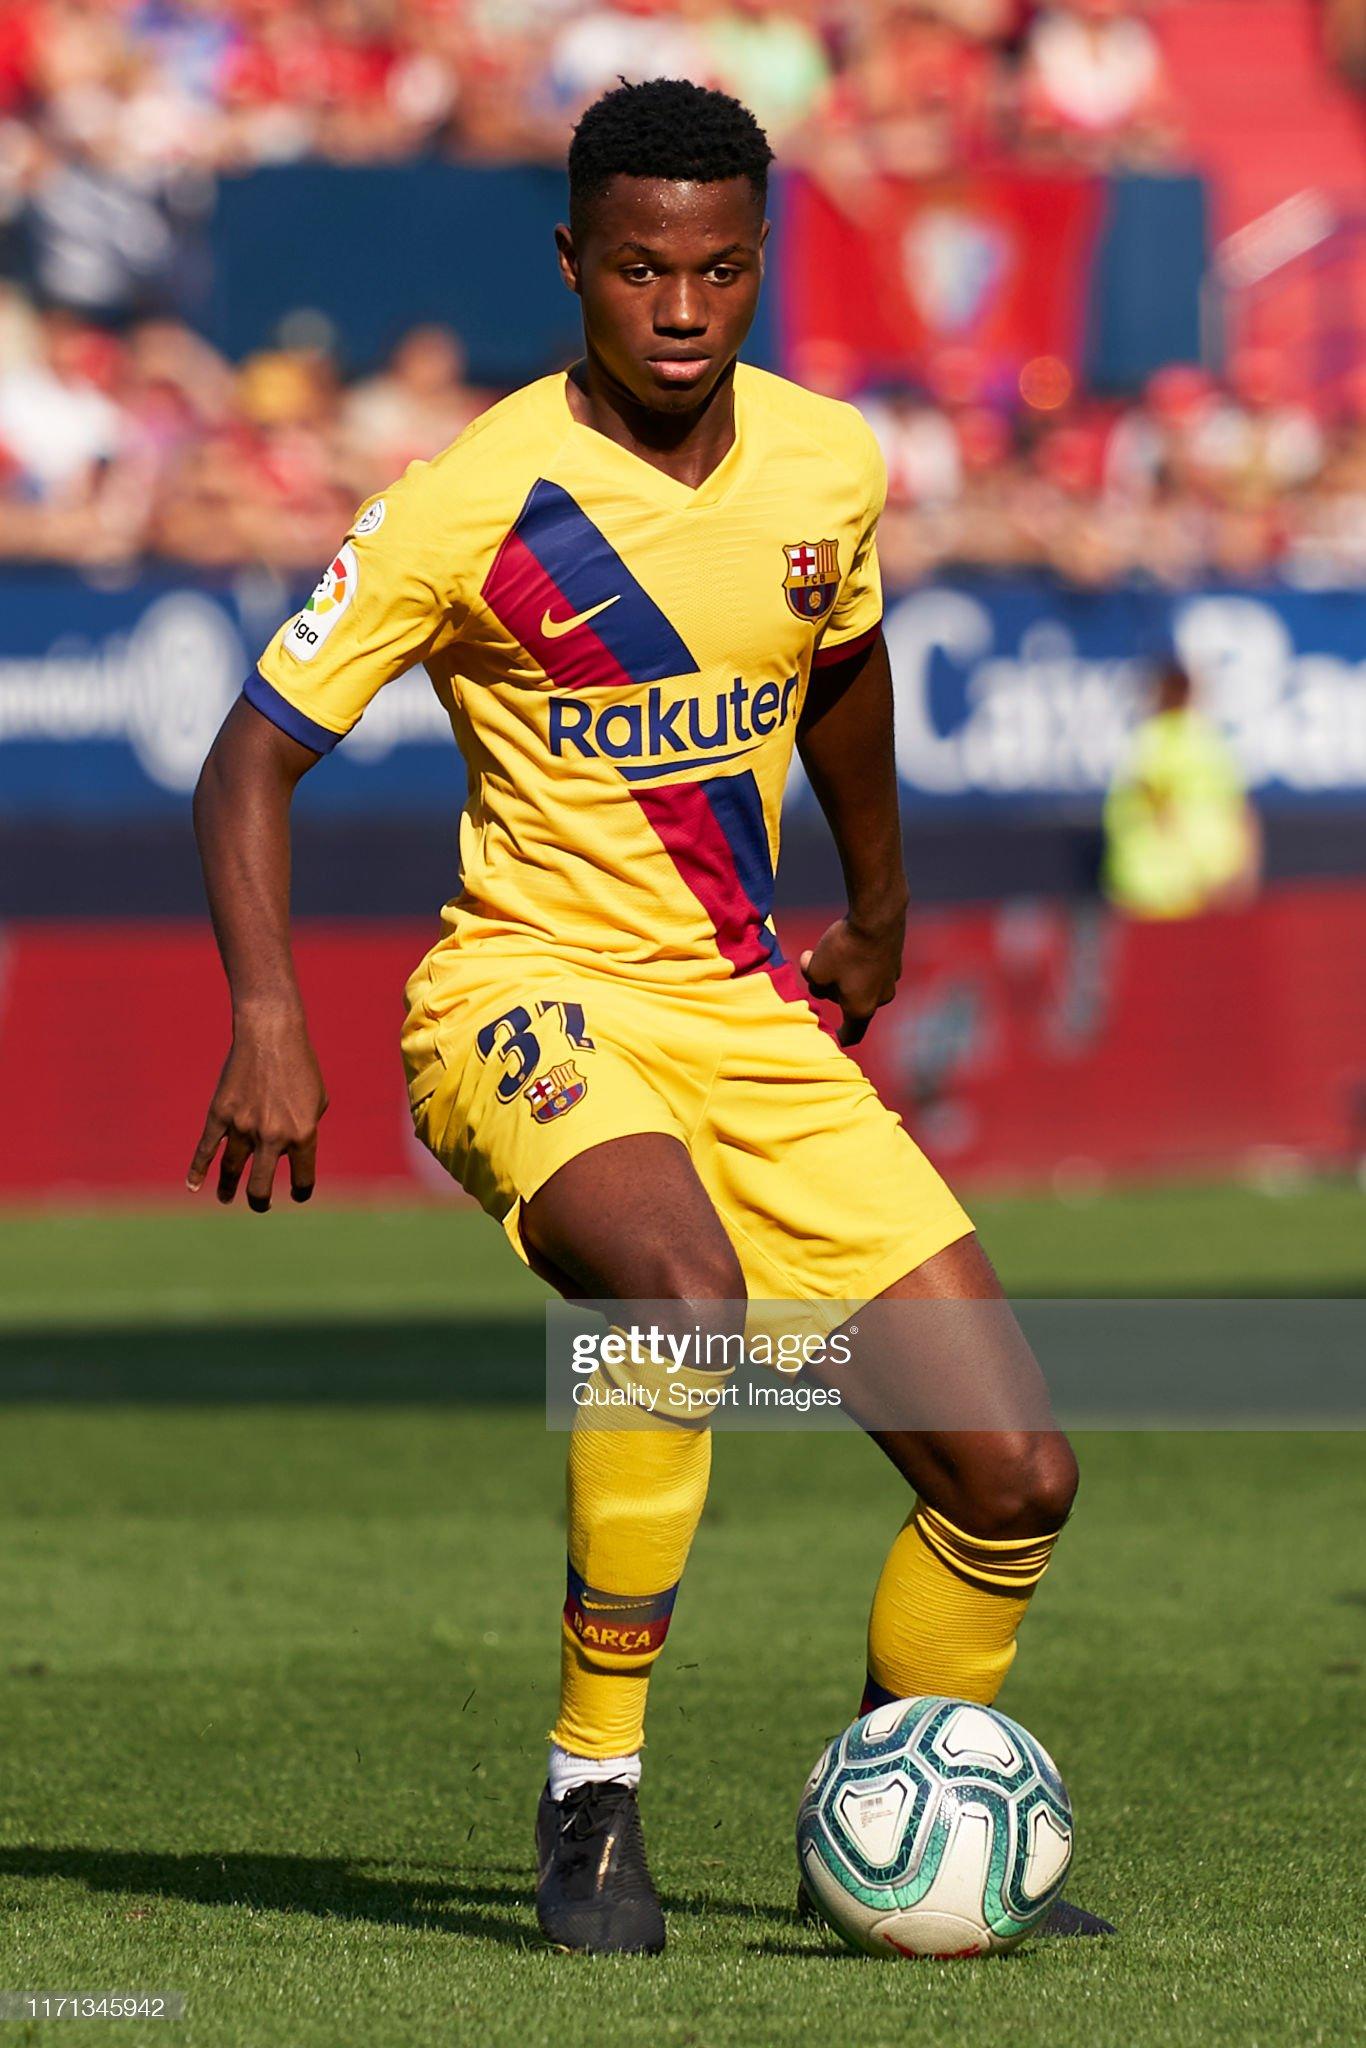 صور مباراة : أوساسونا - برشلونة 2-2 ( 31-08-2019 )  Anssumane-fati-of-fc-barcelona-in-action-during-the-liga-match-ca-picture-id1171345942?s=2048x2048